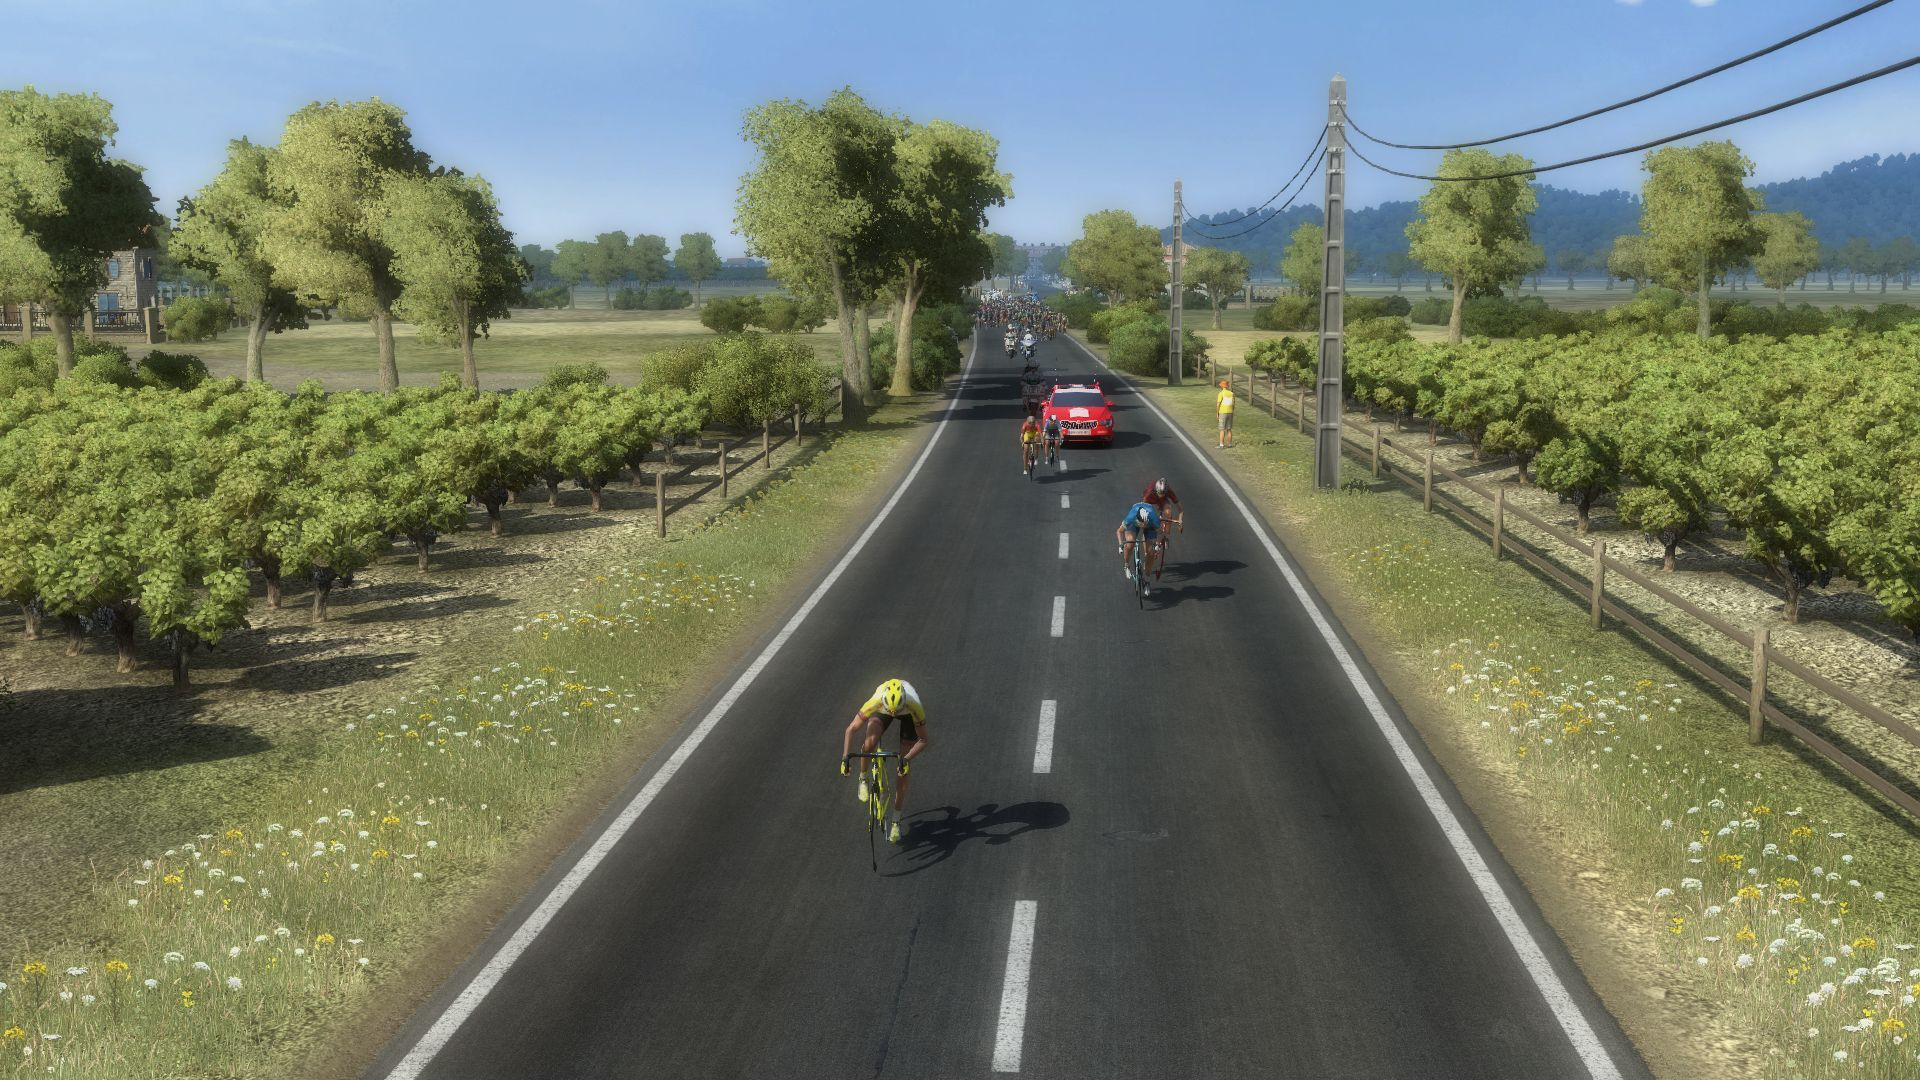 pcmdaily.com/images/mg/2019/Races/PT/Tirreno/mg19_ta_s07_14.jpg